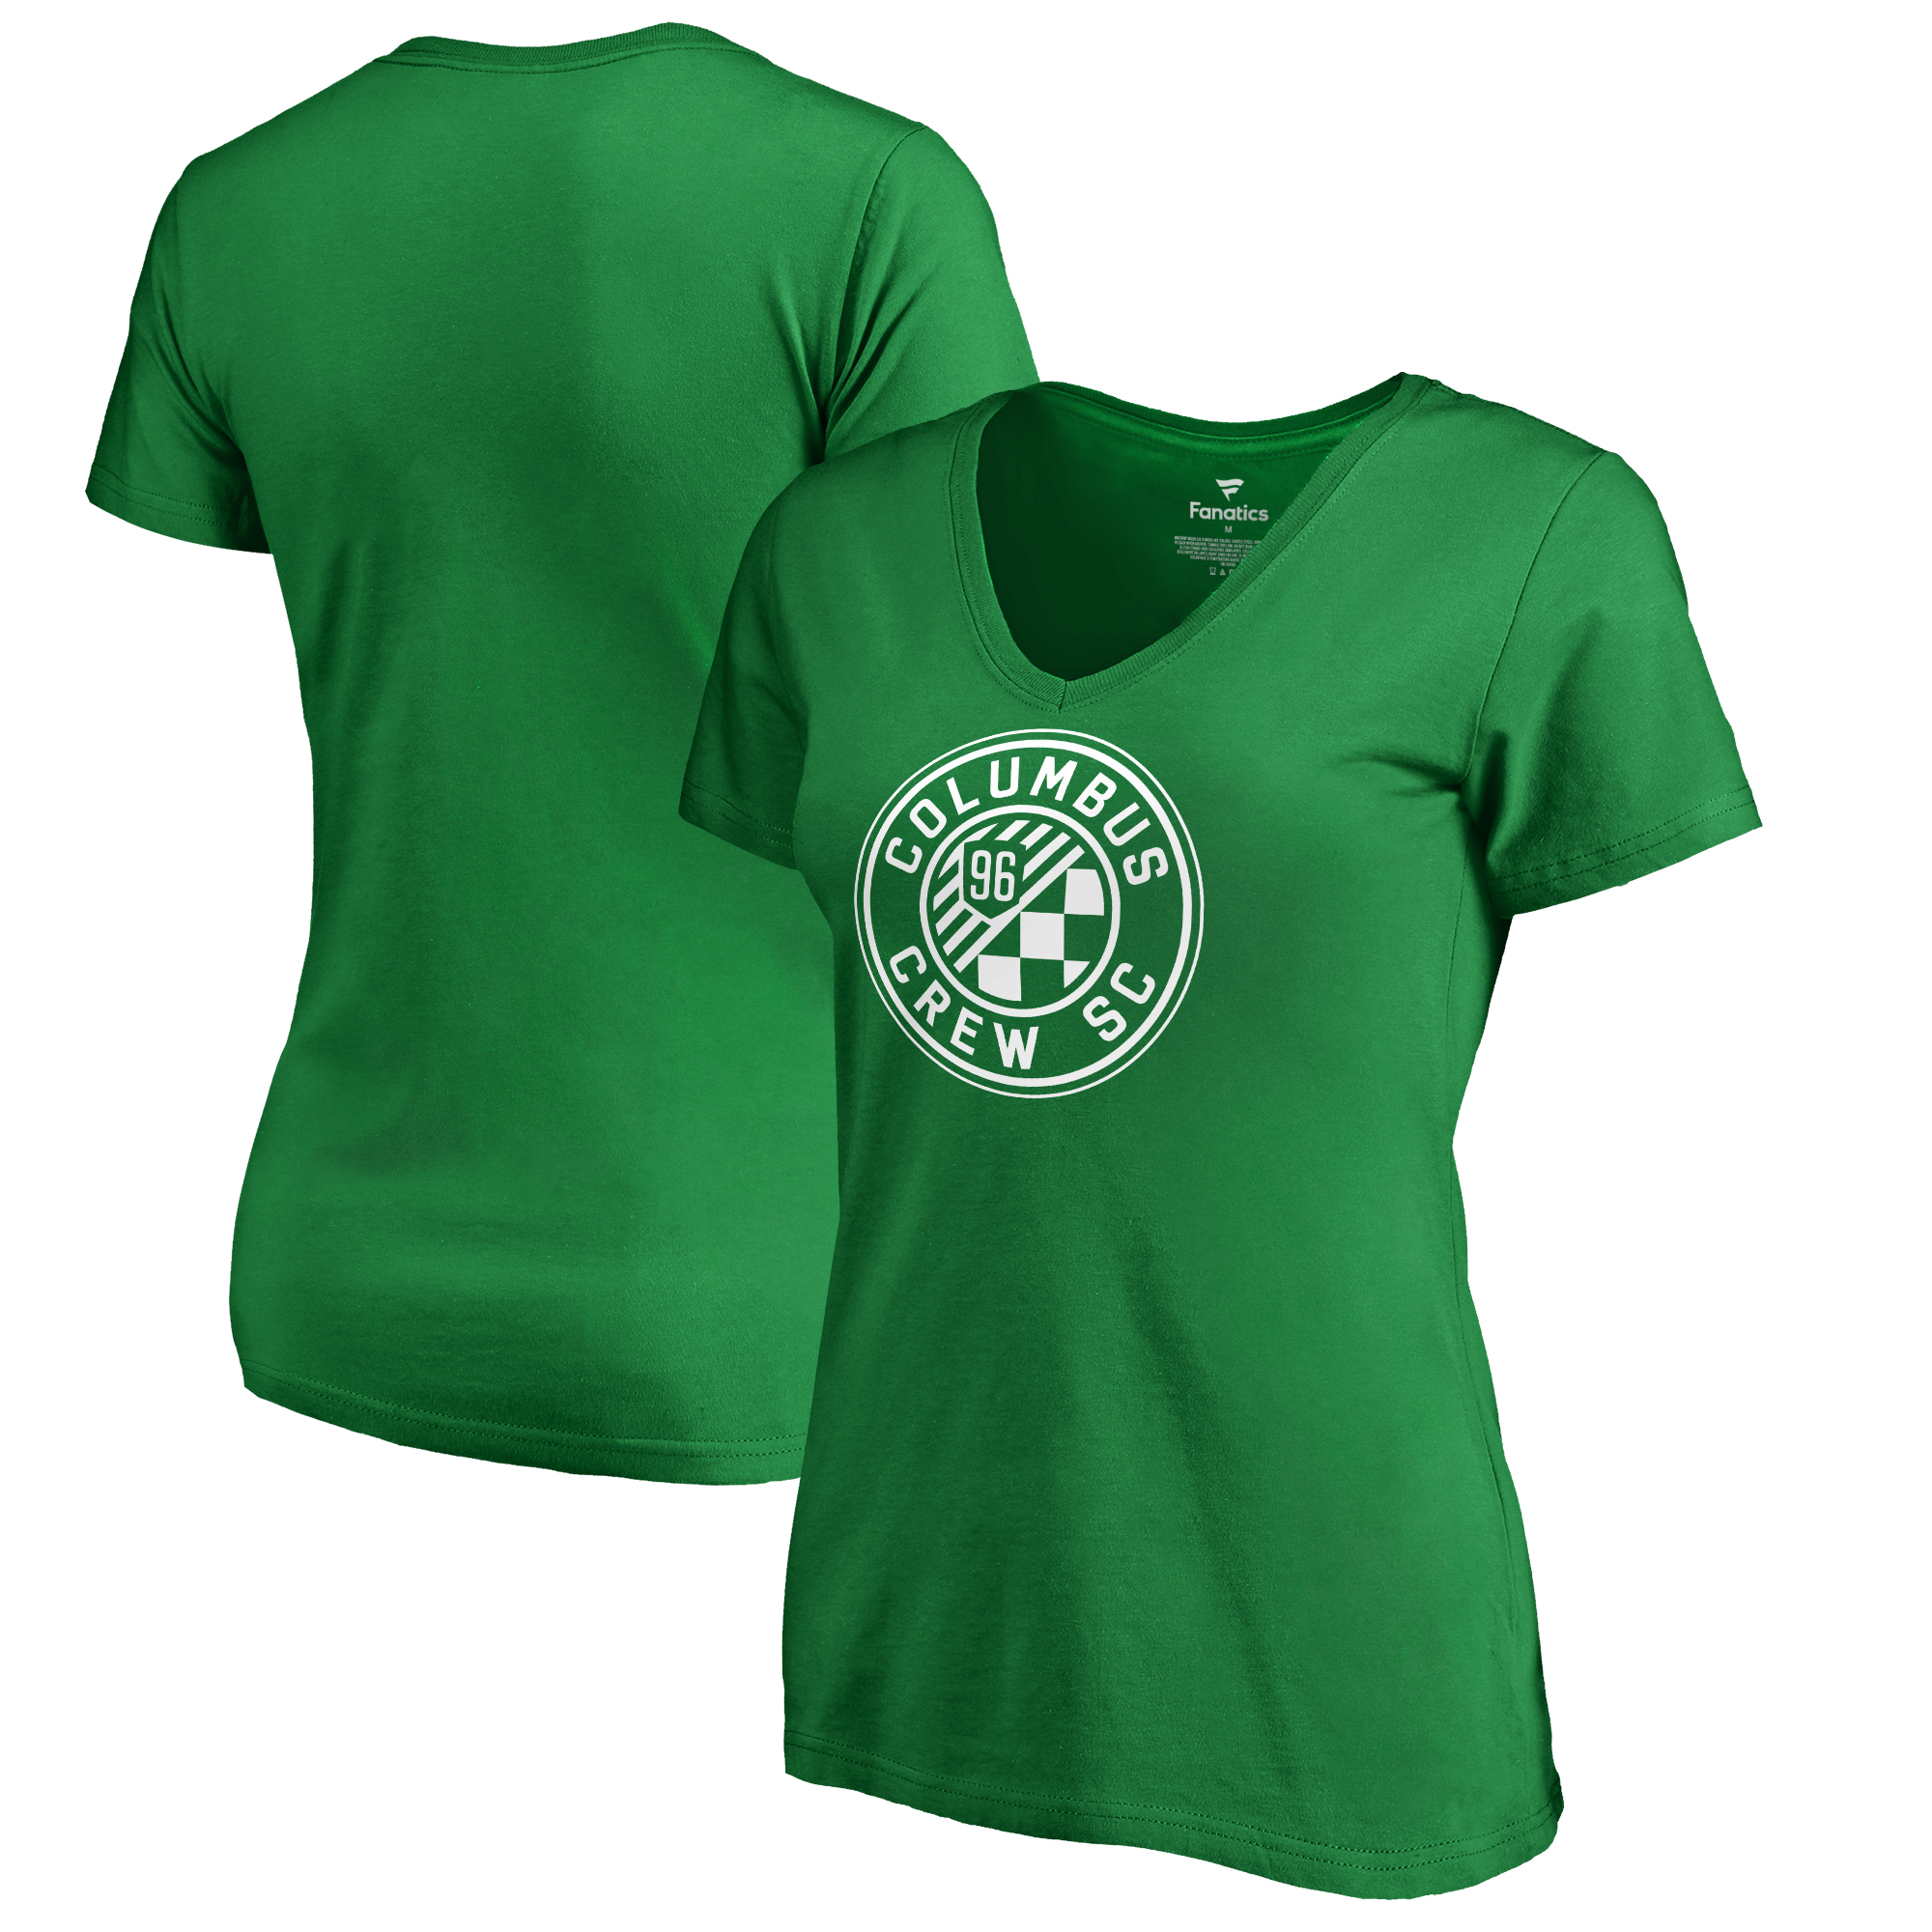 Columbus Crew SC Fanatics Branded Women's St. Patrick's Day White Logo V-Neck T-Shirt - Kelly Green